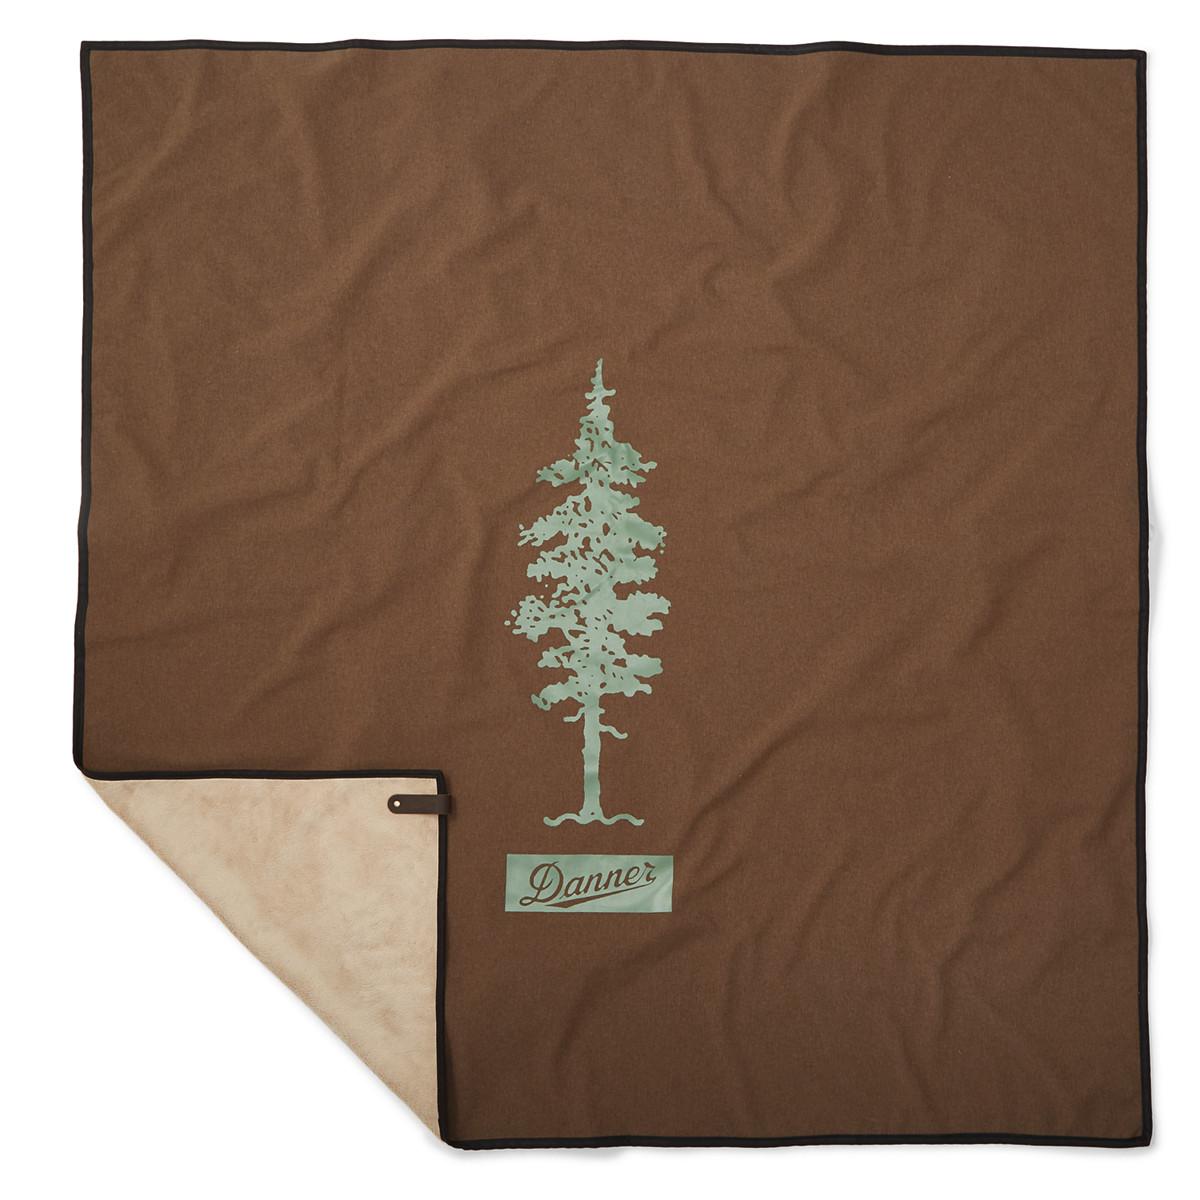 Belmont Blanket x Danner Hellagood - Tan